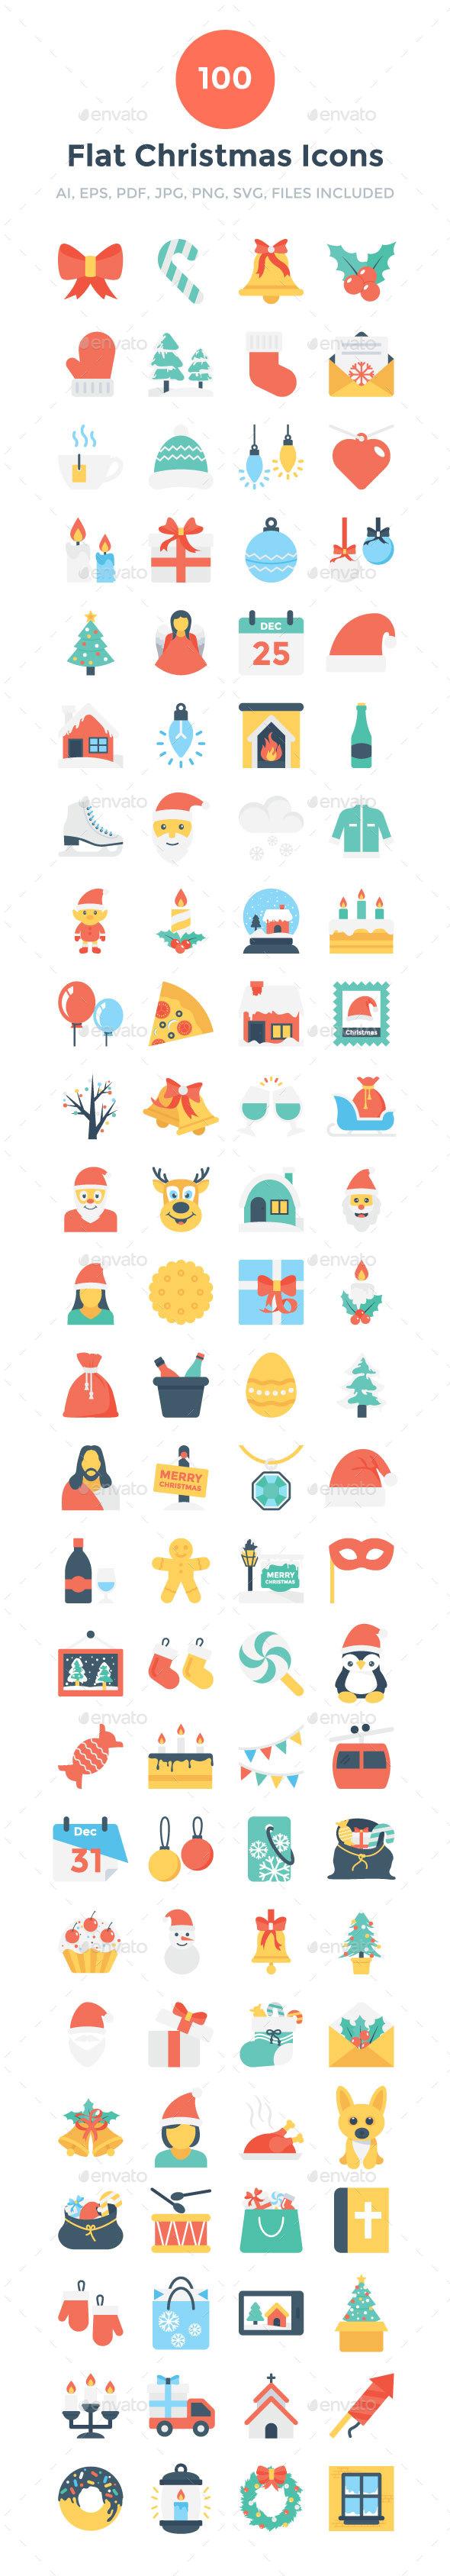 100 Flat Christmas Icons - Icons